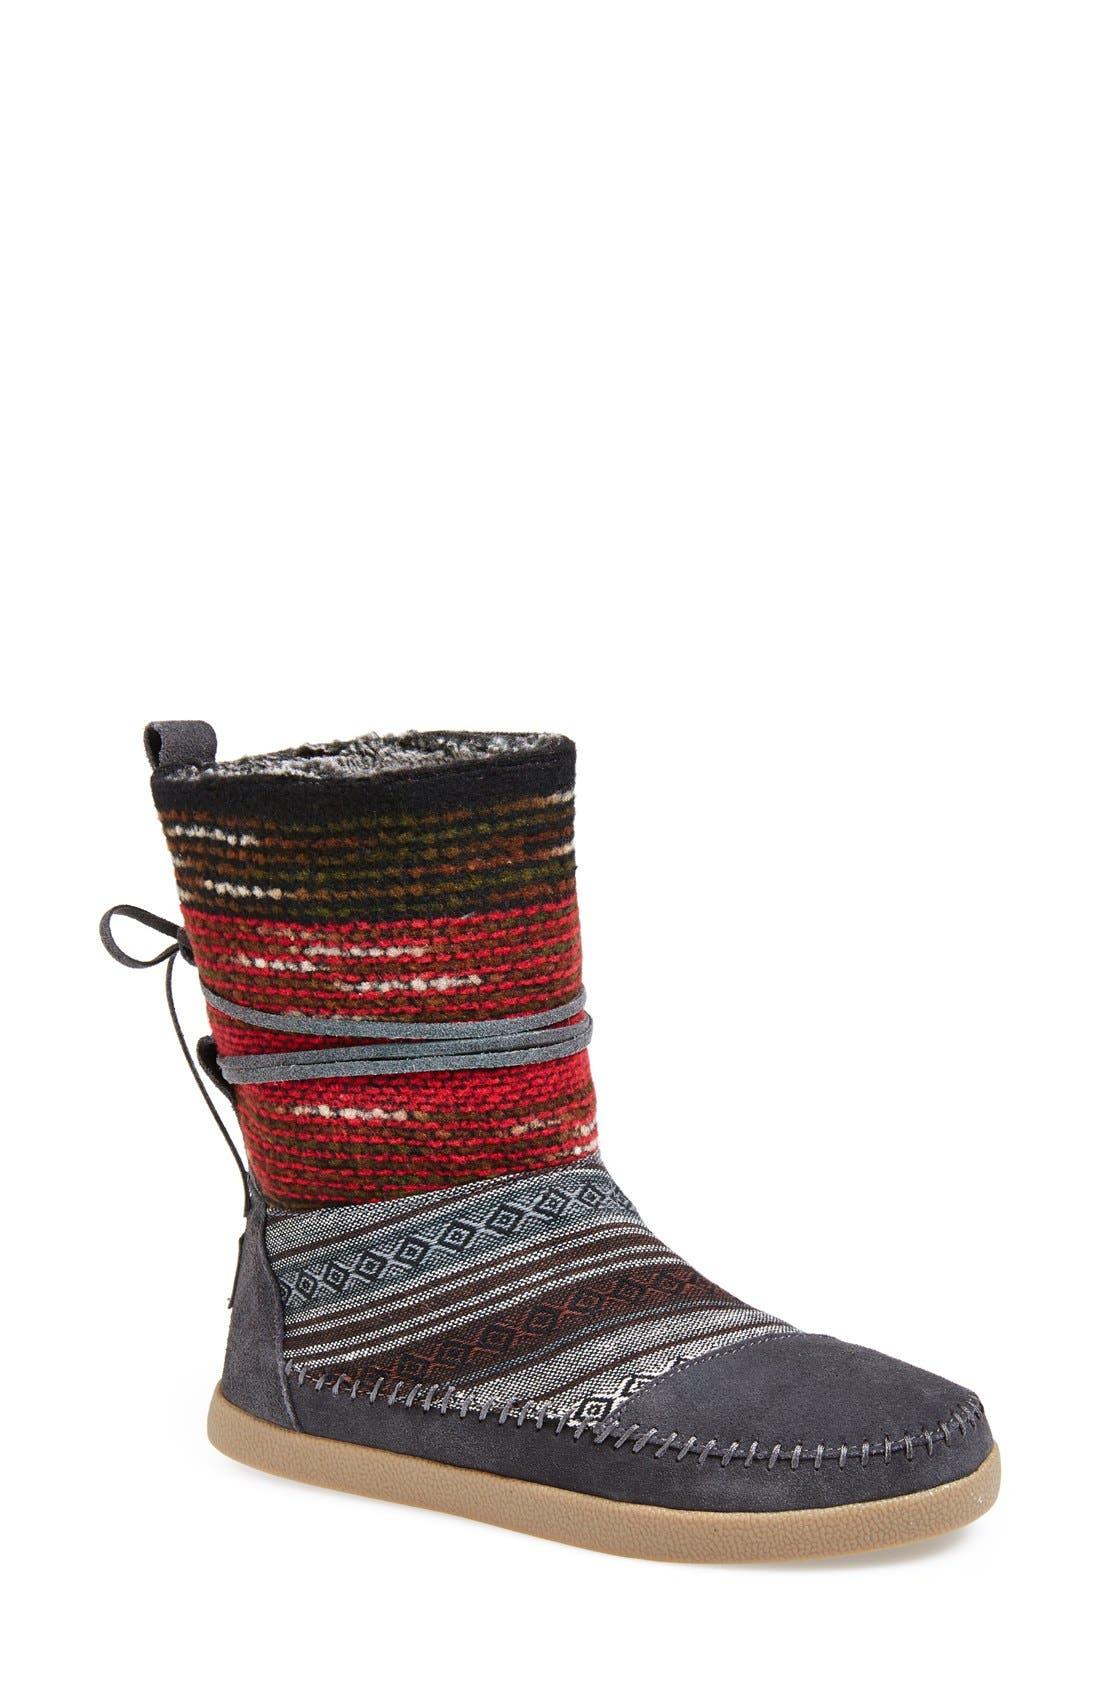 Main Image - TOMS 'Nepal' Boot (Women)